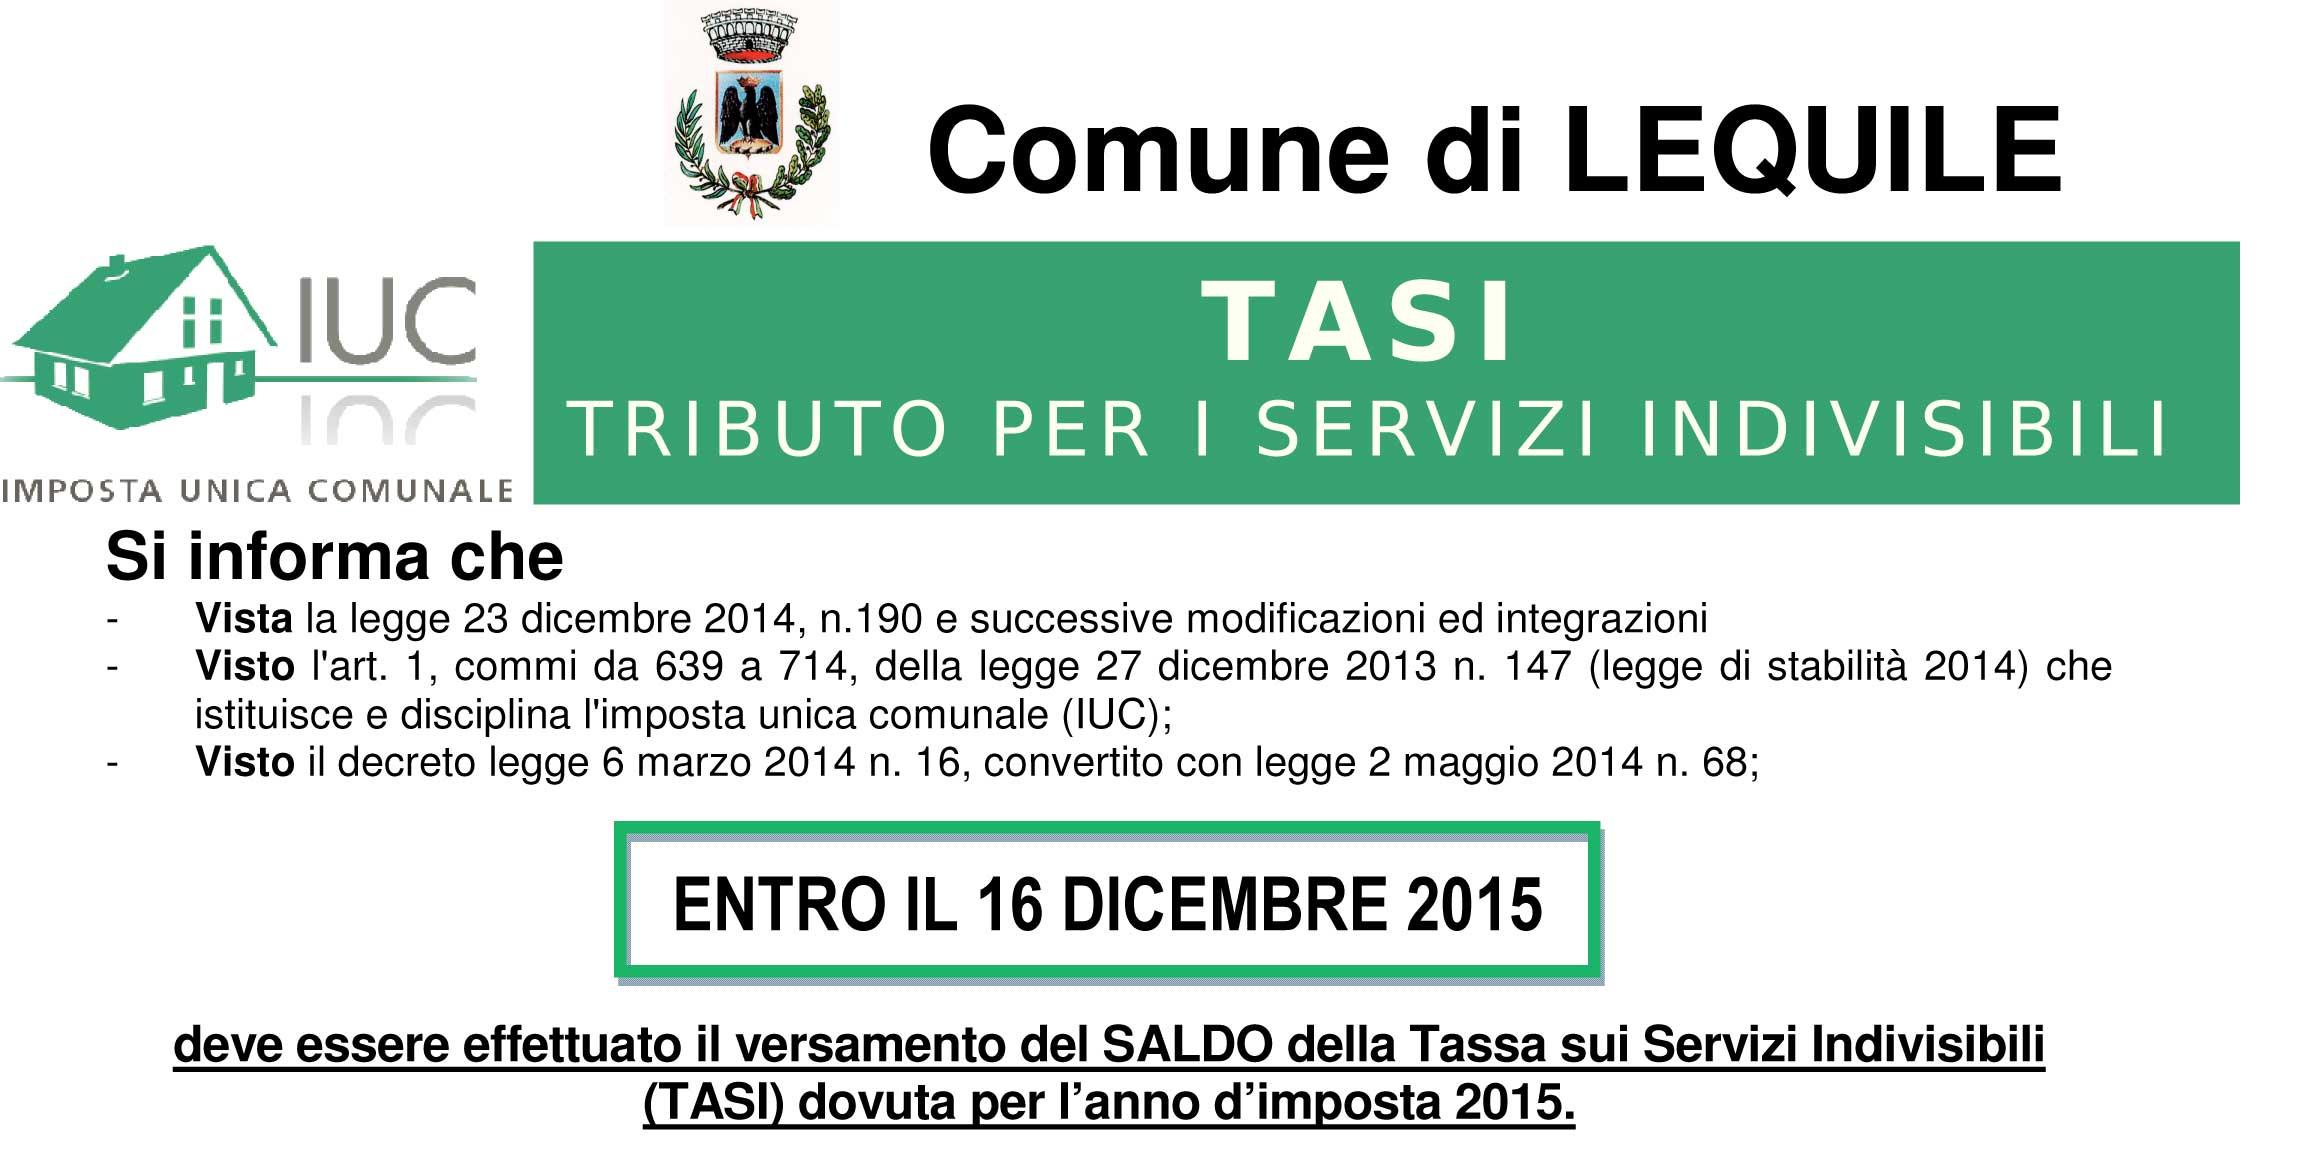 Tassa sui Servizi Indivisibili (TASI) dovuta per l'anno d'imposta 2015 – scad. 16.12.2015